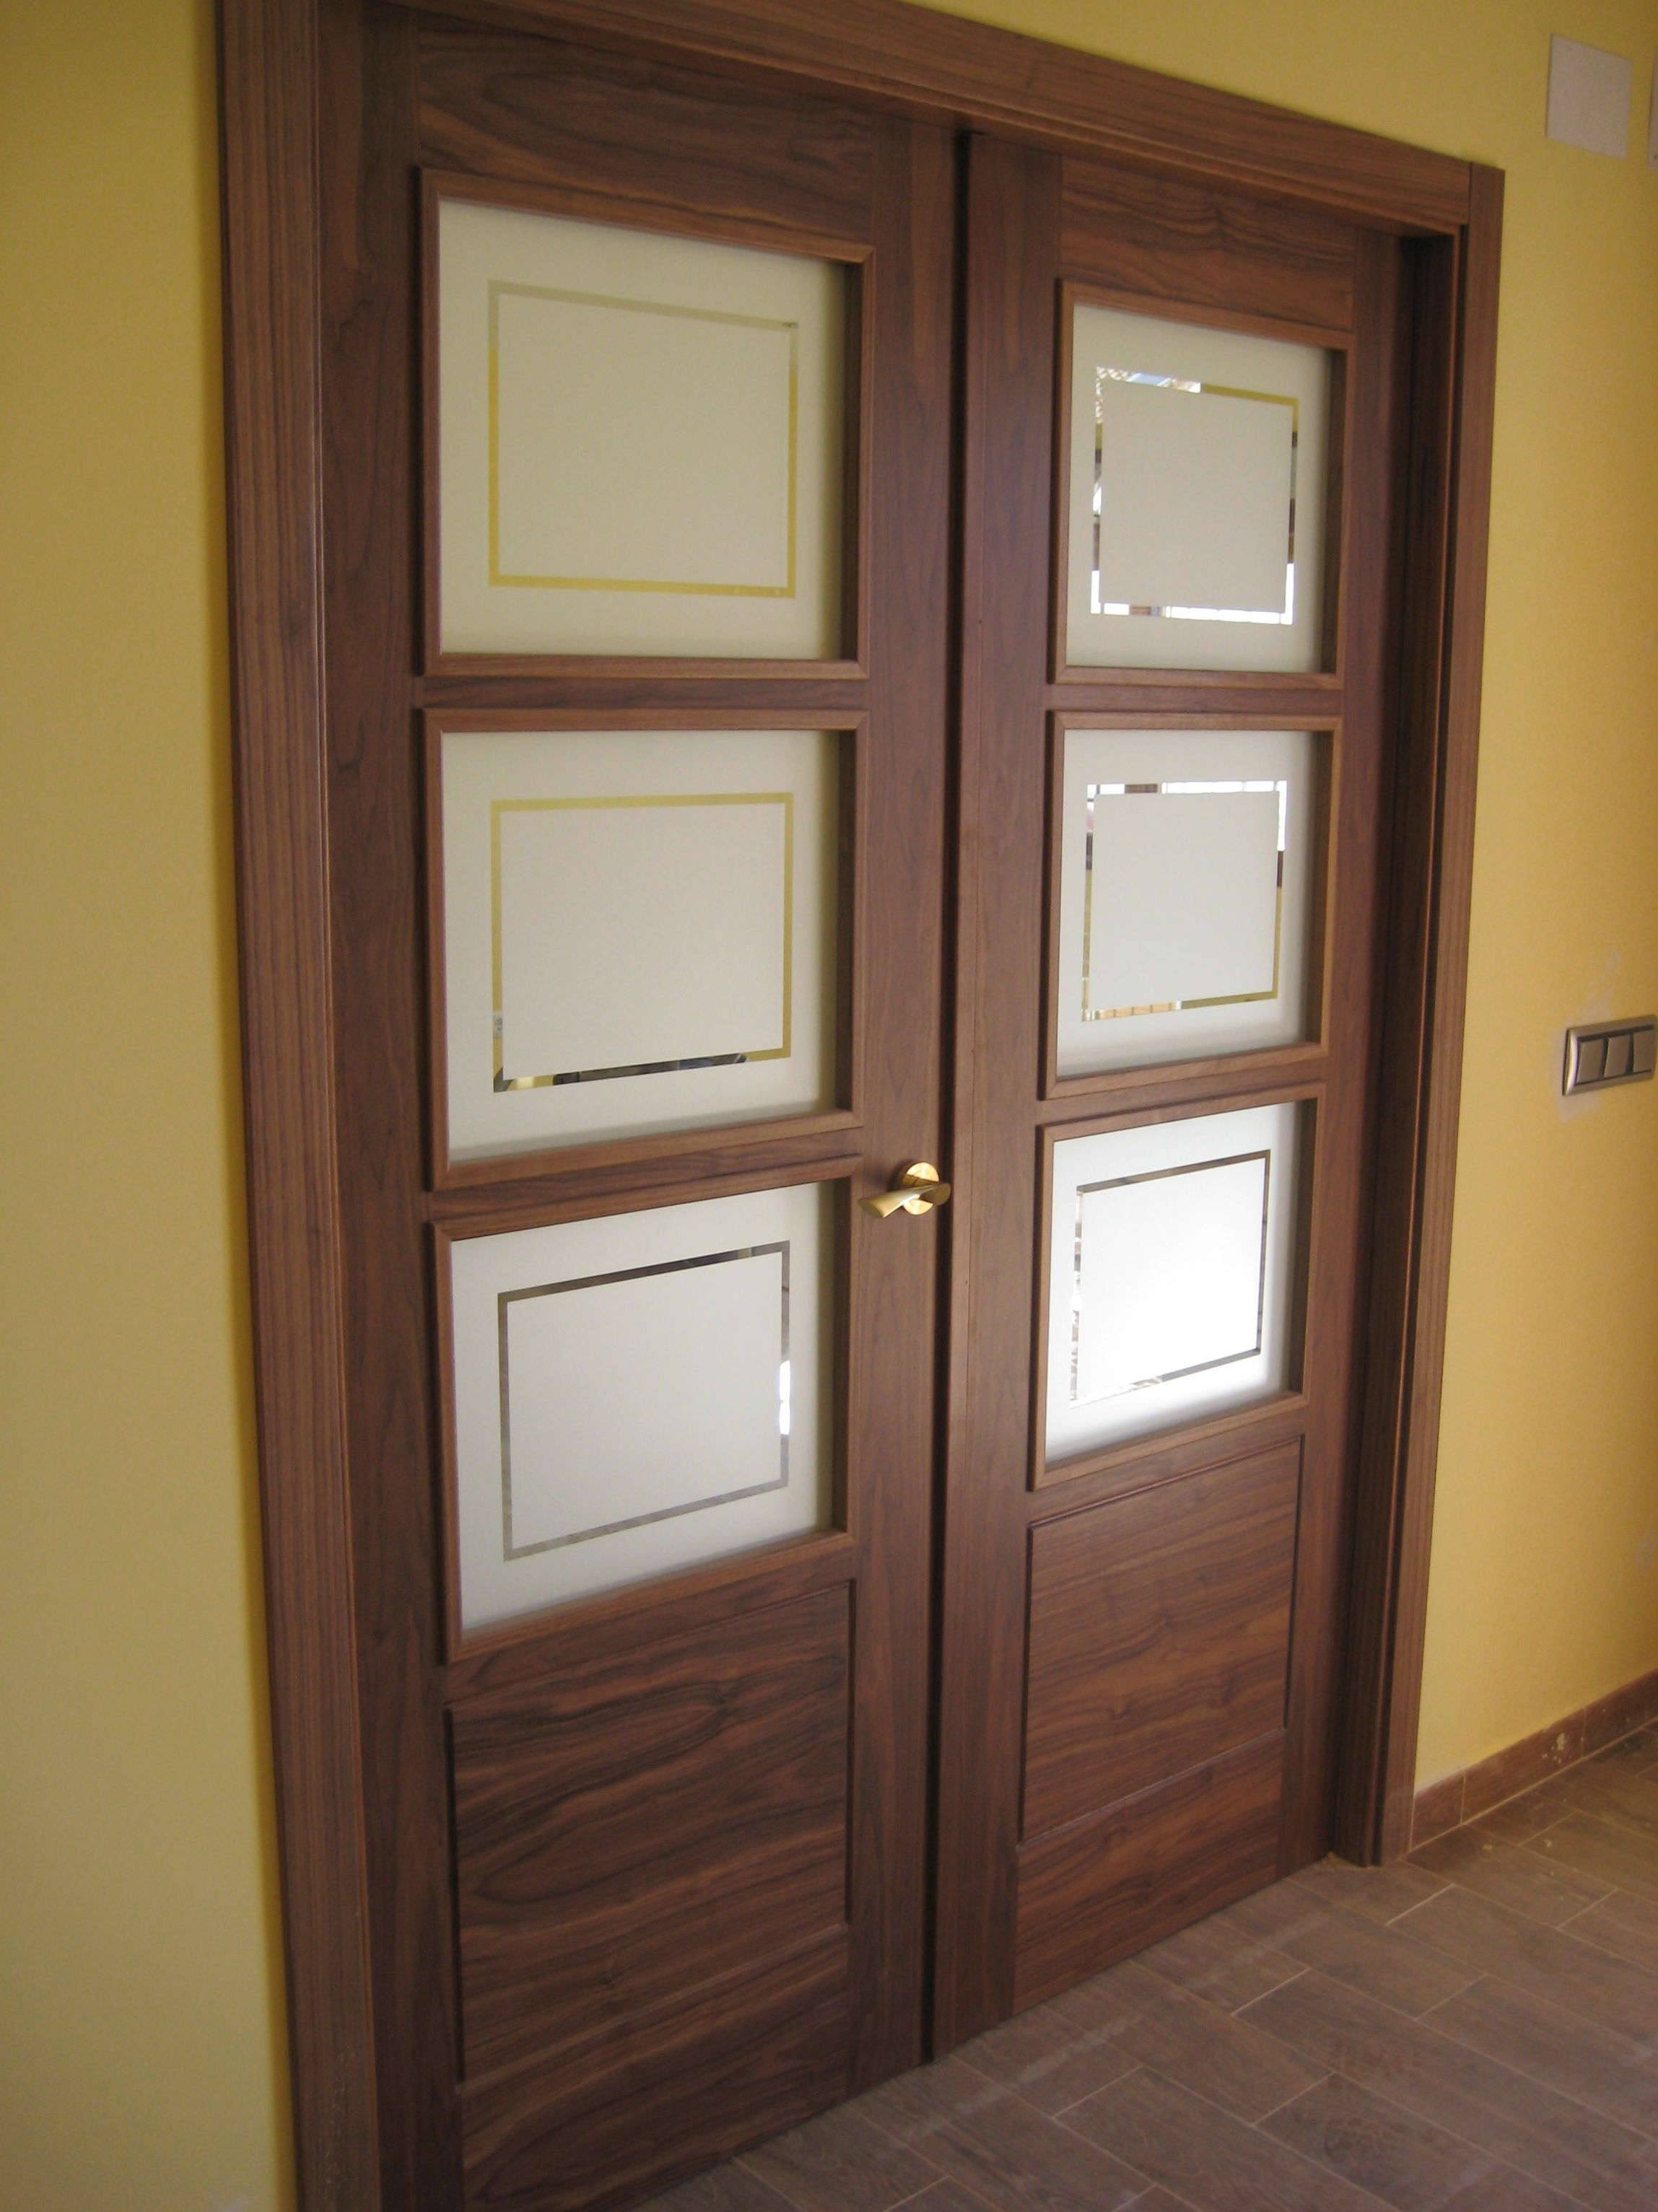 Foto 8 de carpinter a de madera en yuncler carpinter a jano - Puertas de salon ...